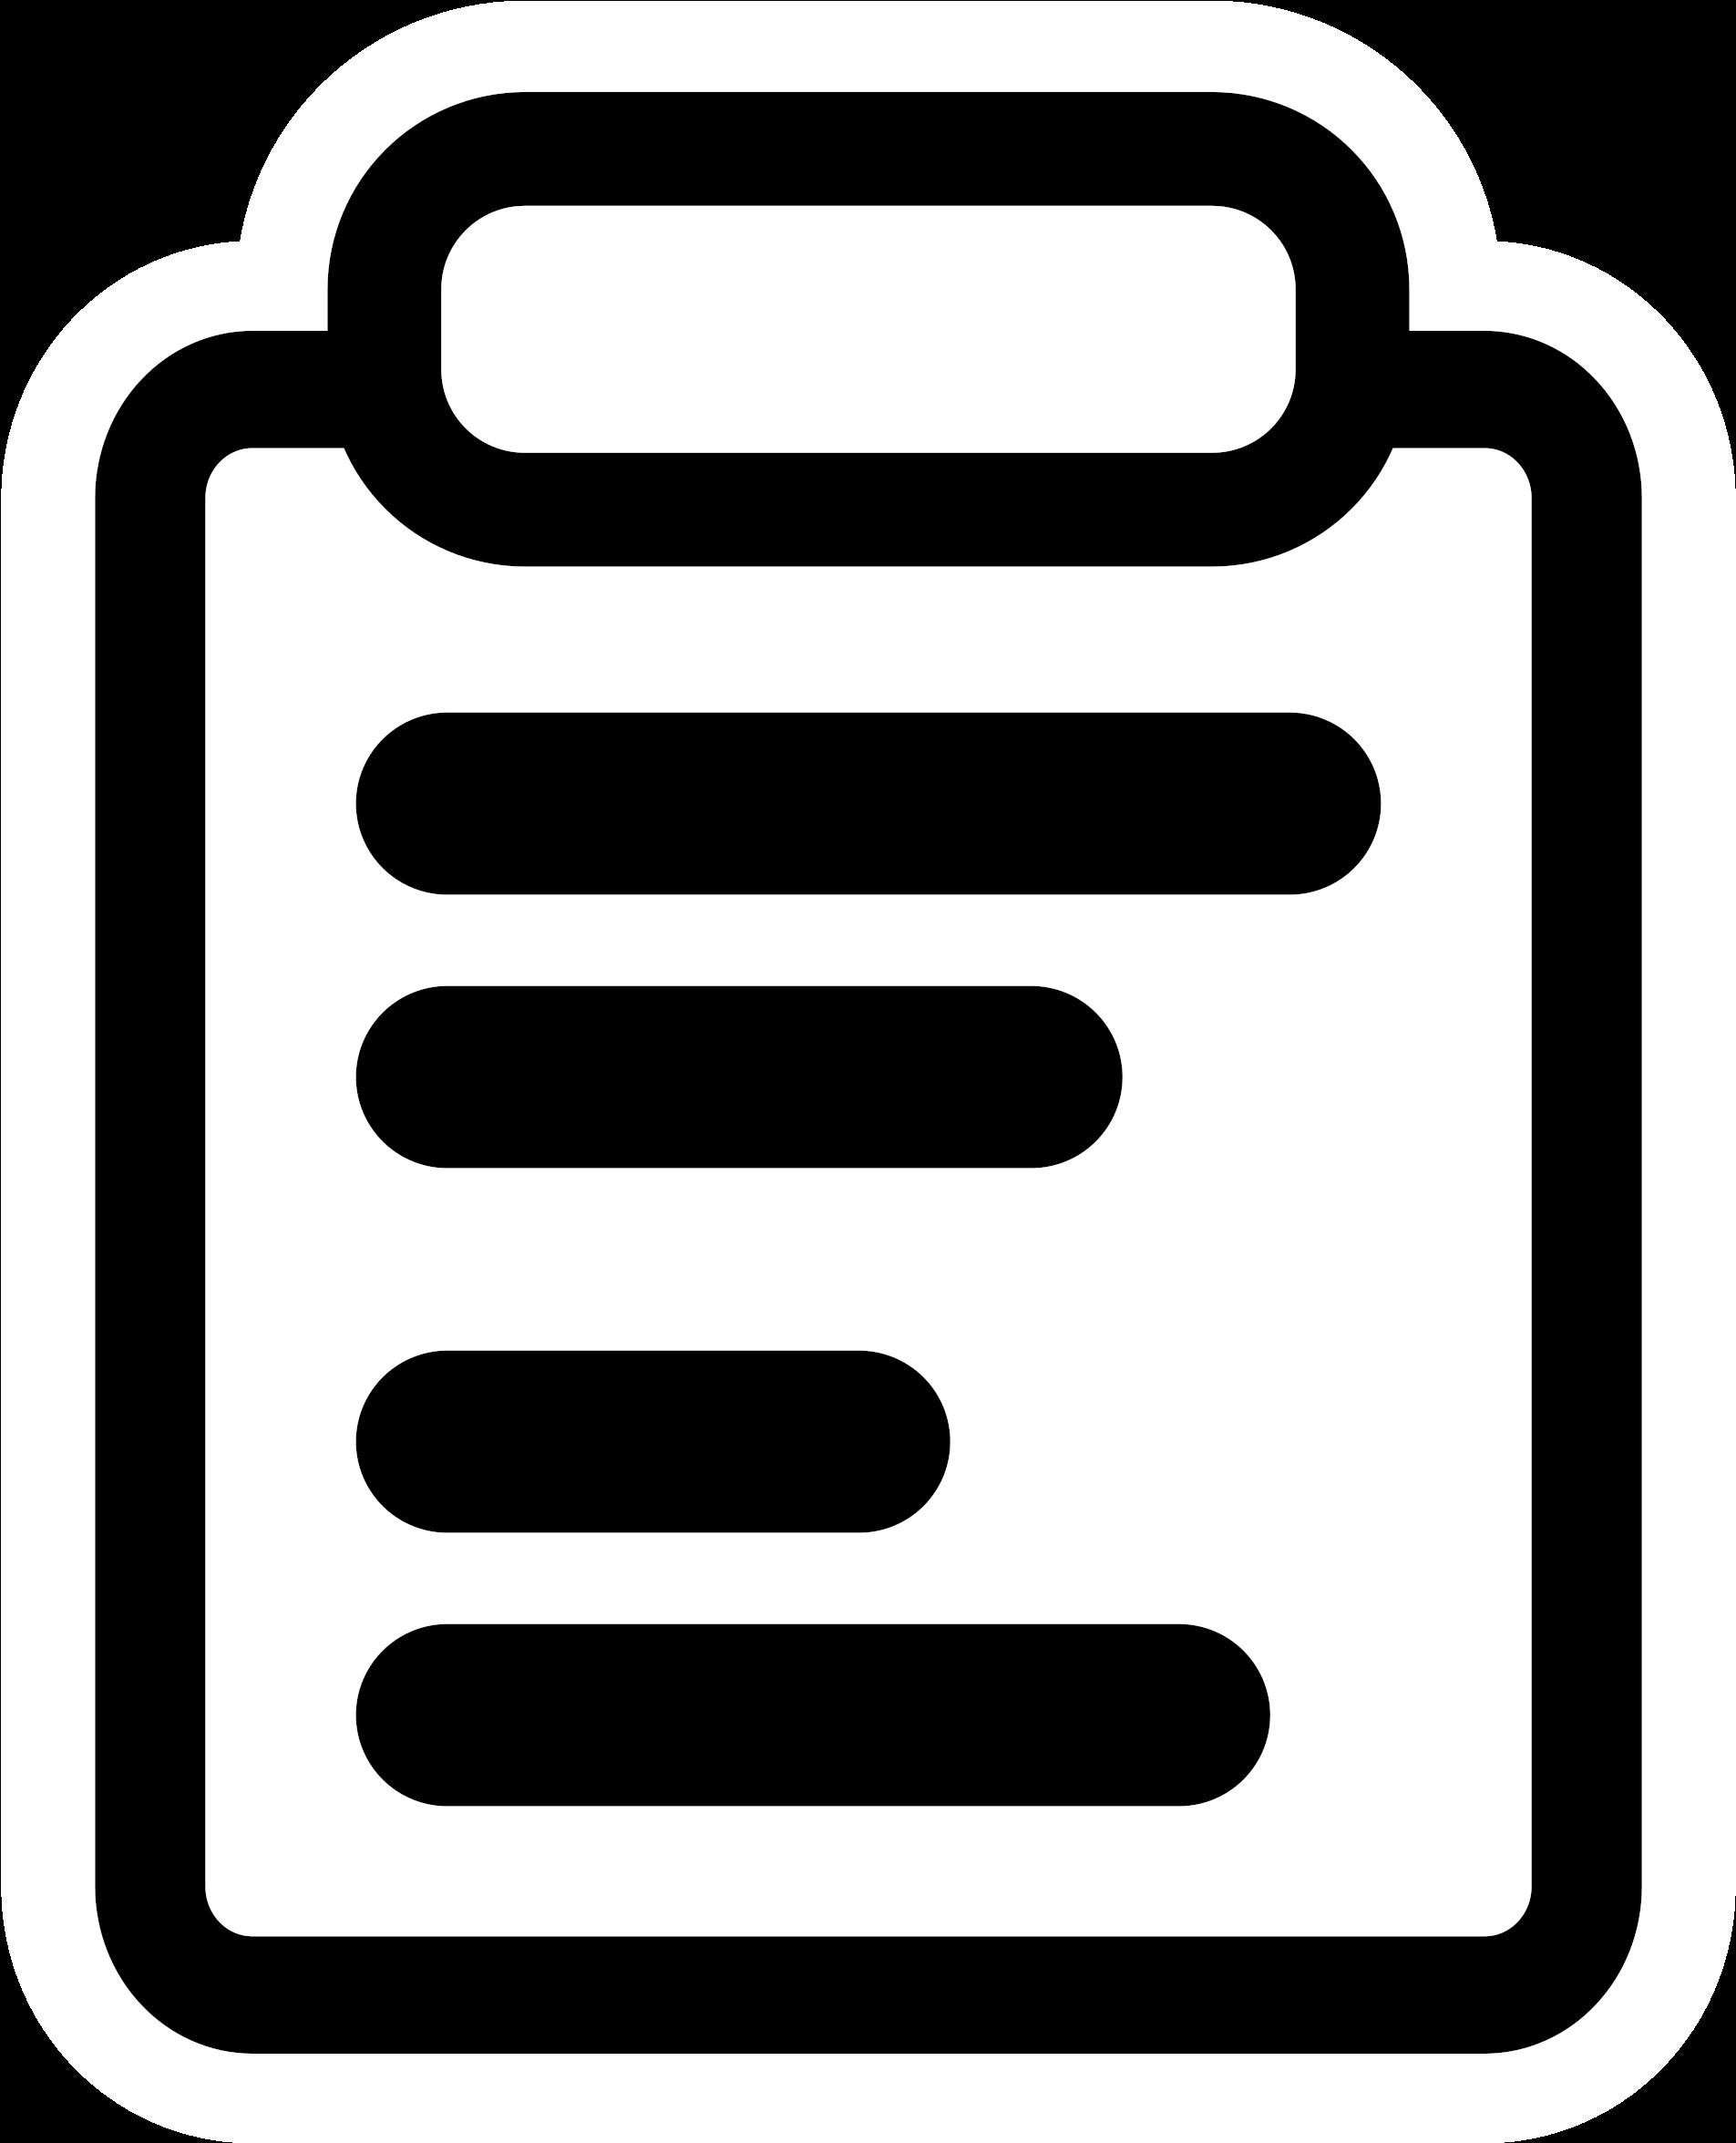 Transparent report card clipart - 14 Cliparts For Free Download Report Clipart Clip Art - Transparent Report Clip Art